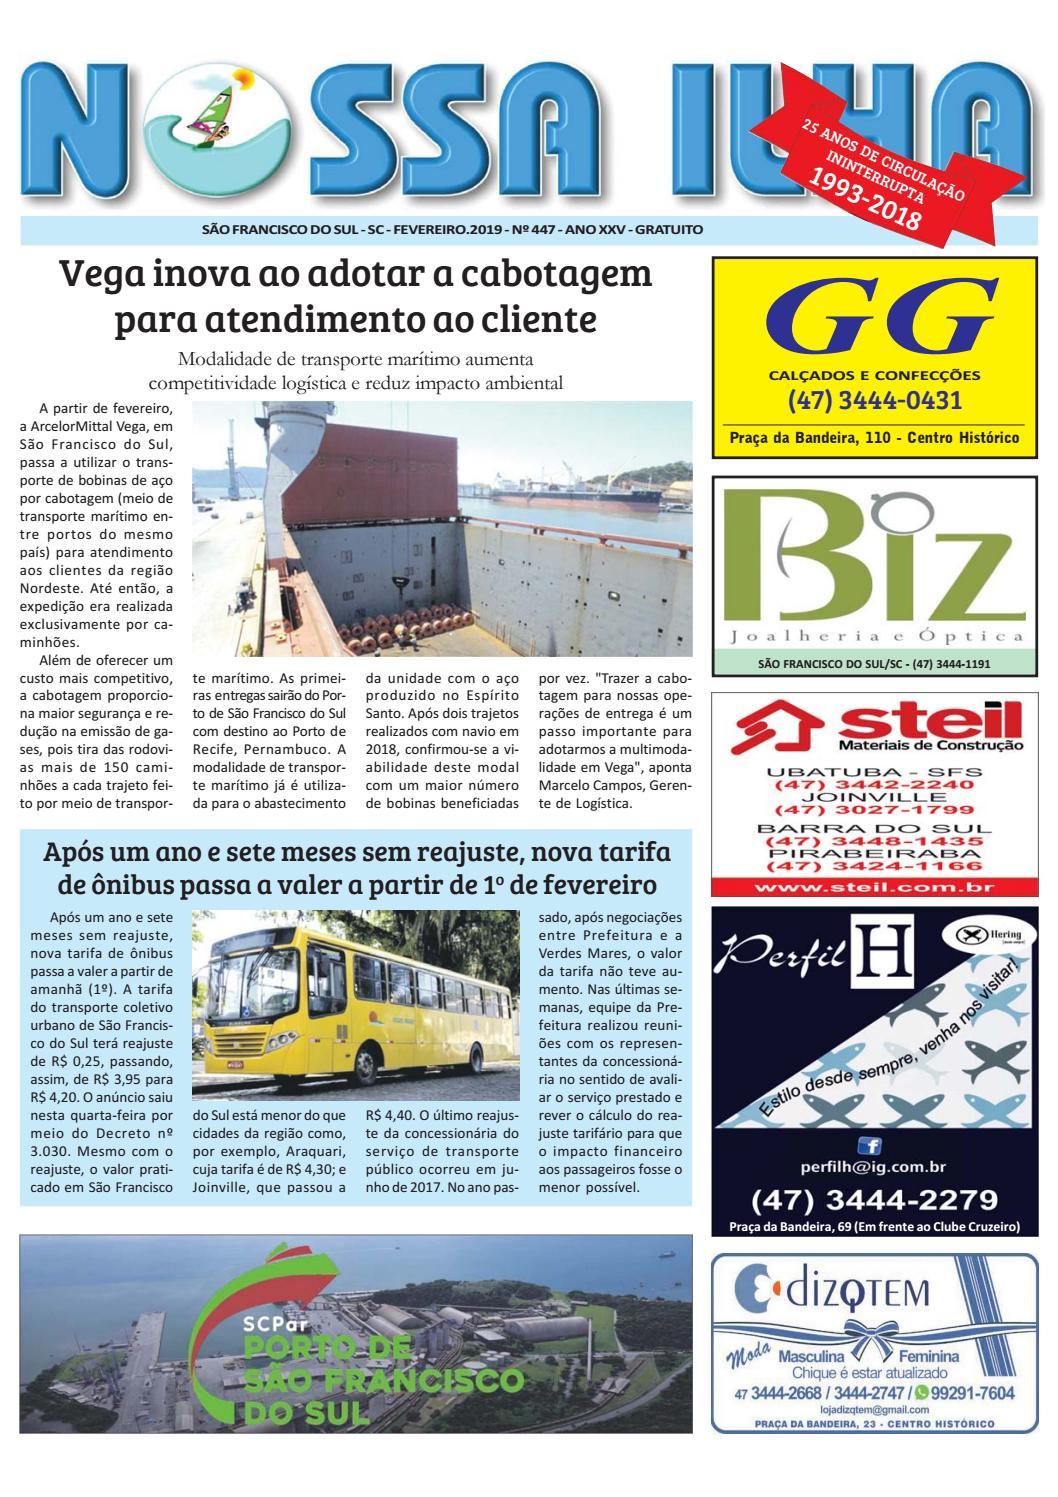 566b56f1c5a88 Nossa Ilha - 1ª quinzena fevereiro 2019 by aldemir demir batista - issuu